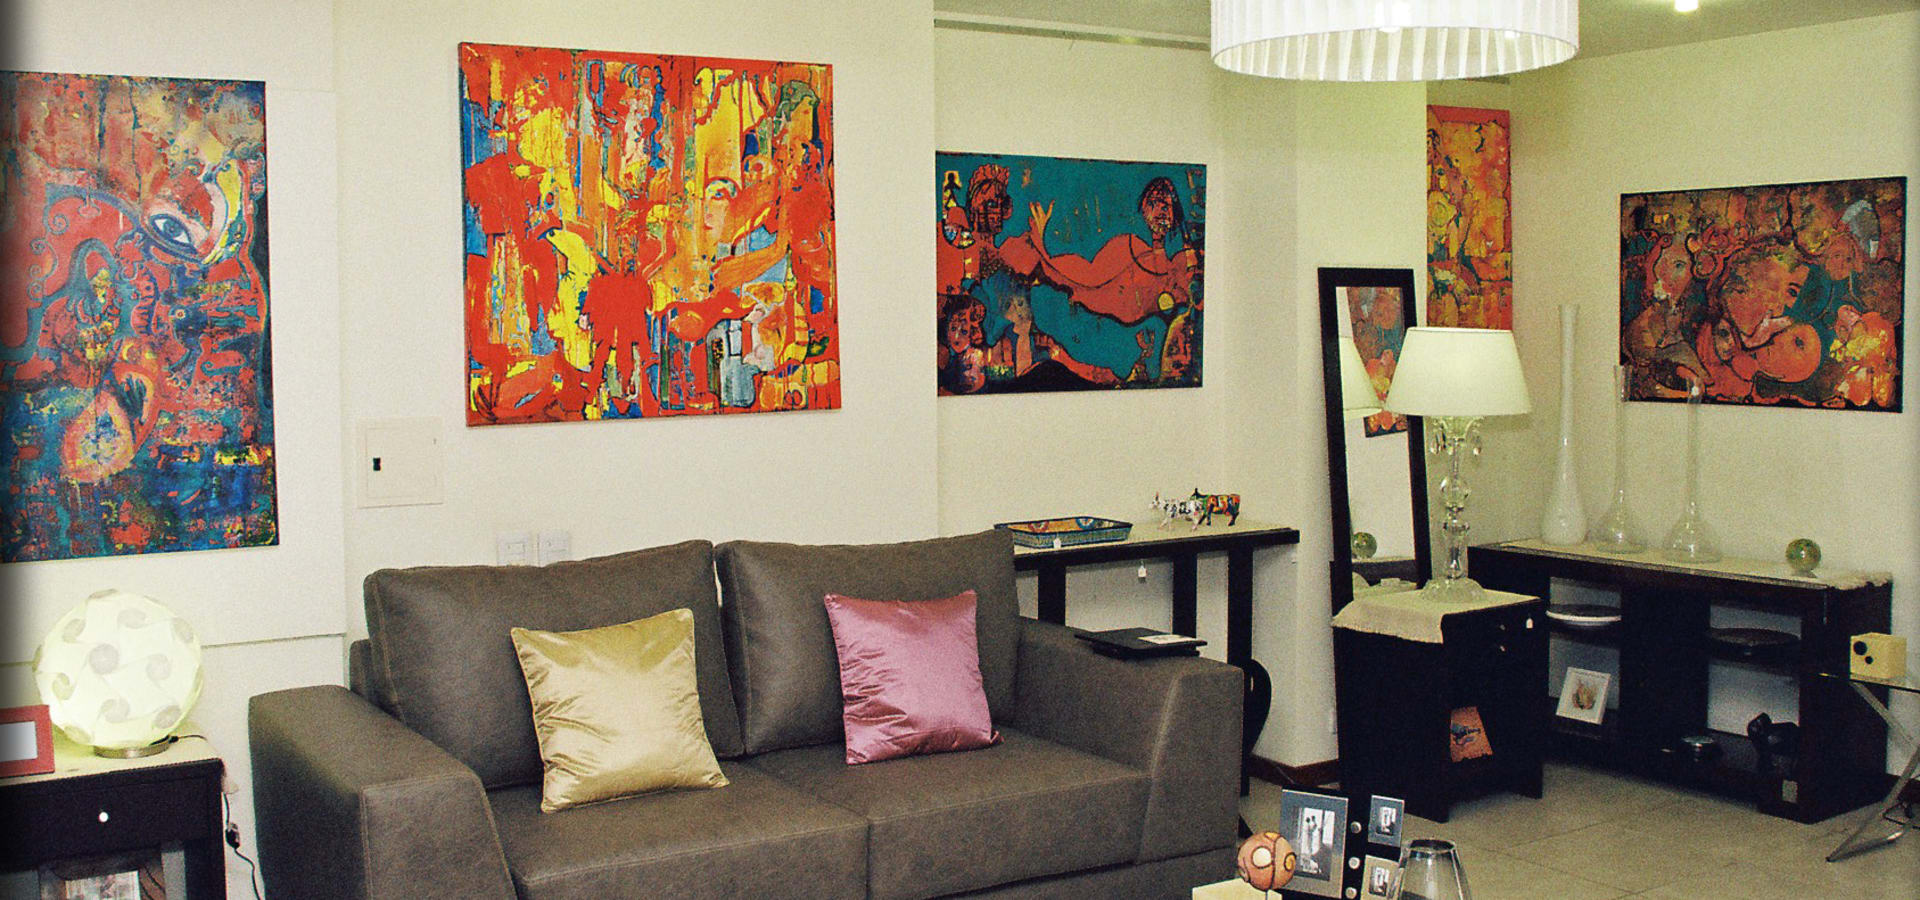 Casa&Arte